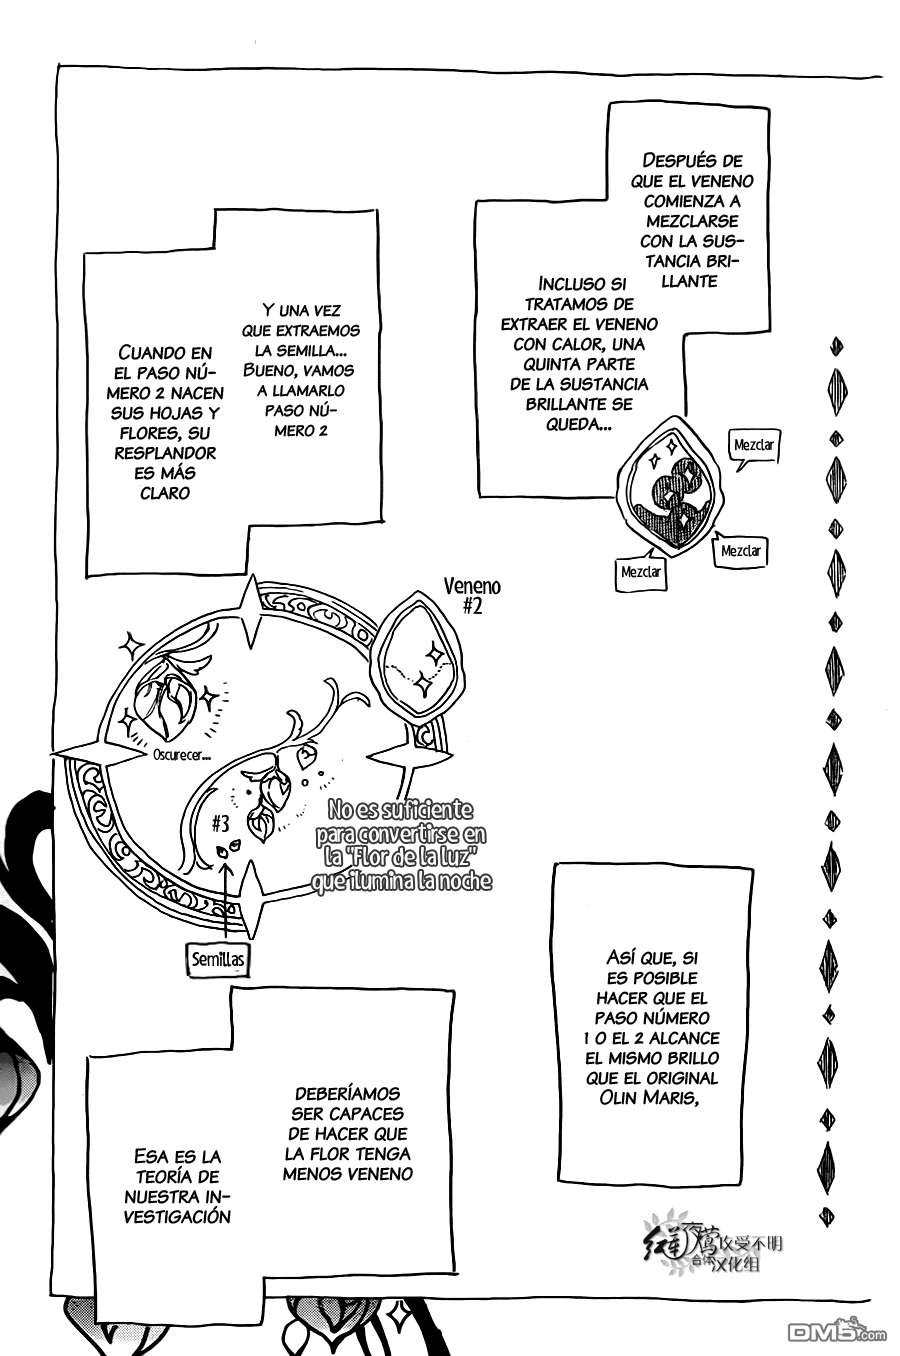 https://c5.ninemanga.com/es_manga/12/16588/420767/275973ae877d6be4be796d14fb79a85c.jpg Page 4